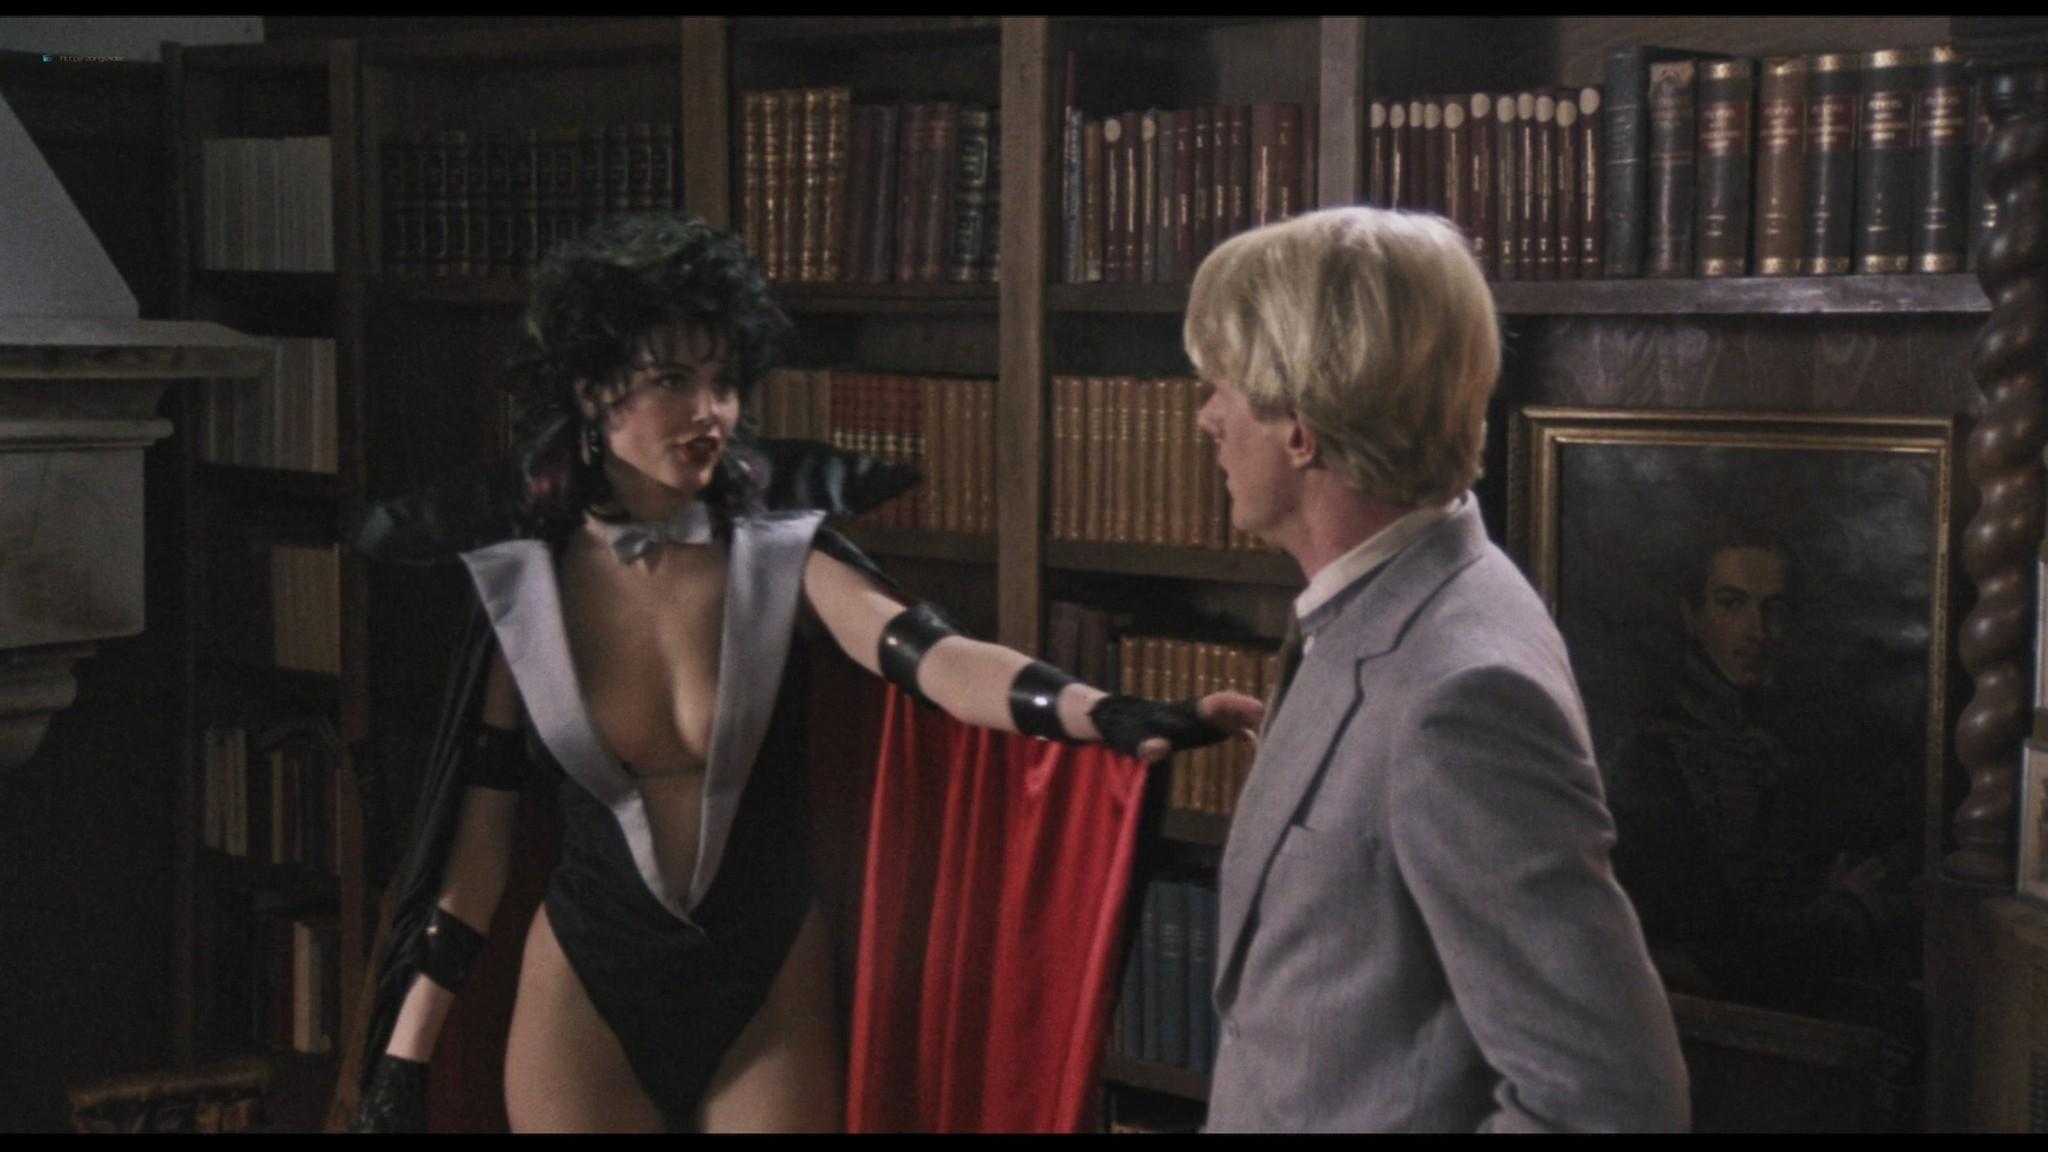 Geena Davis hot and sexy Ksenia Prohaska sexy - Transylvania 6-5000 (1985) HD 1080p BluRay (15)